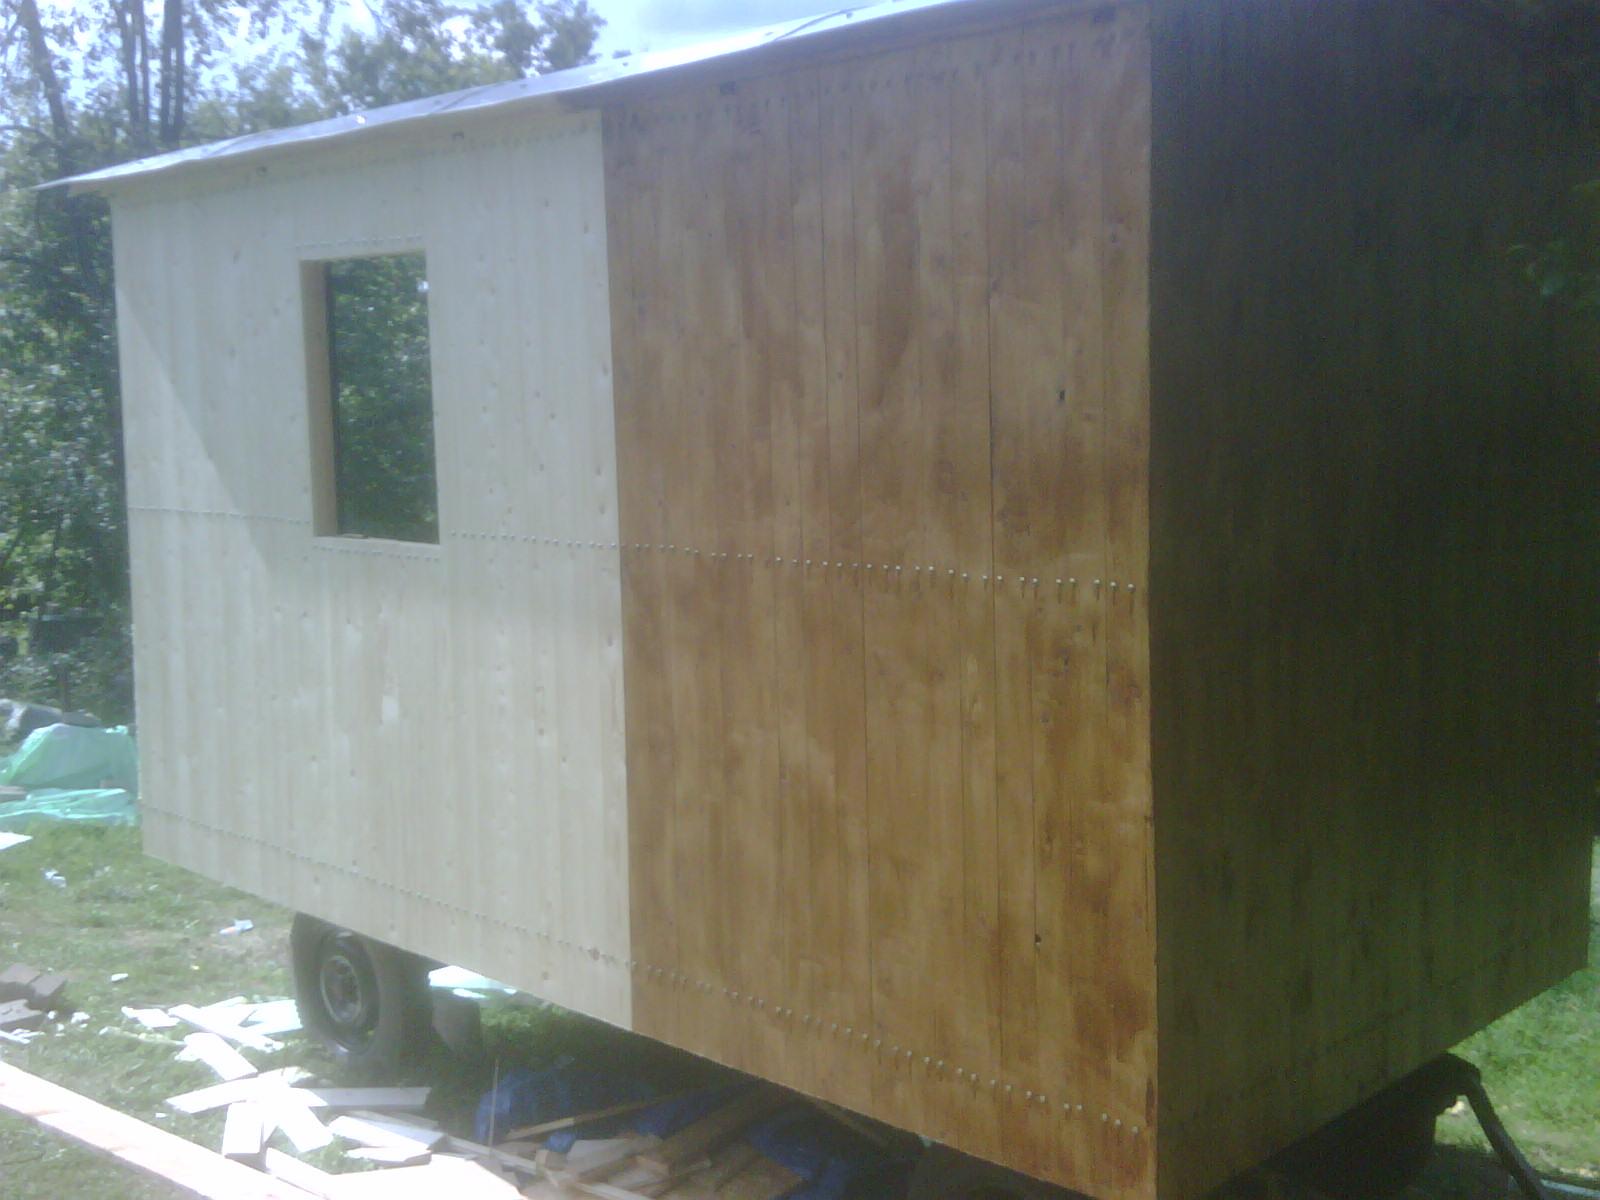 img00341-20100803-1624